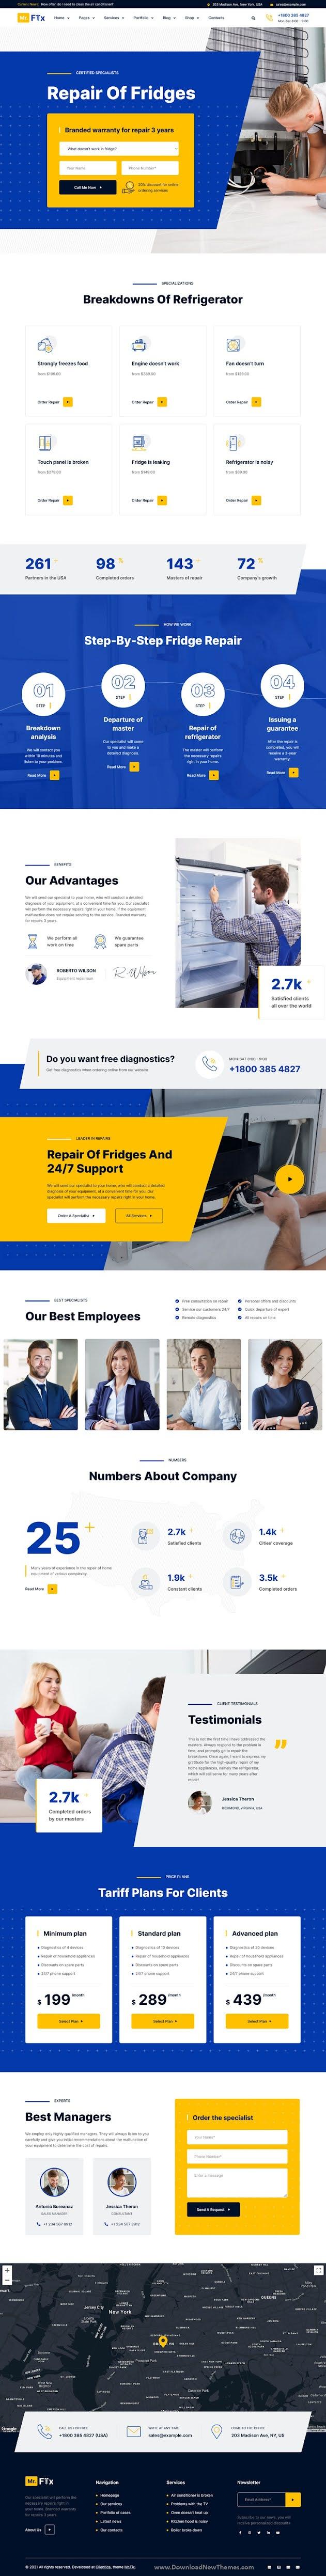 Appliances Repair Services WordPress Theme